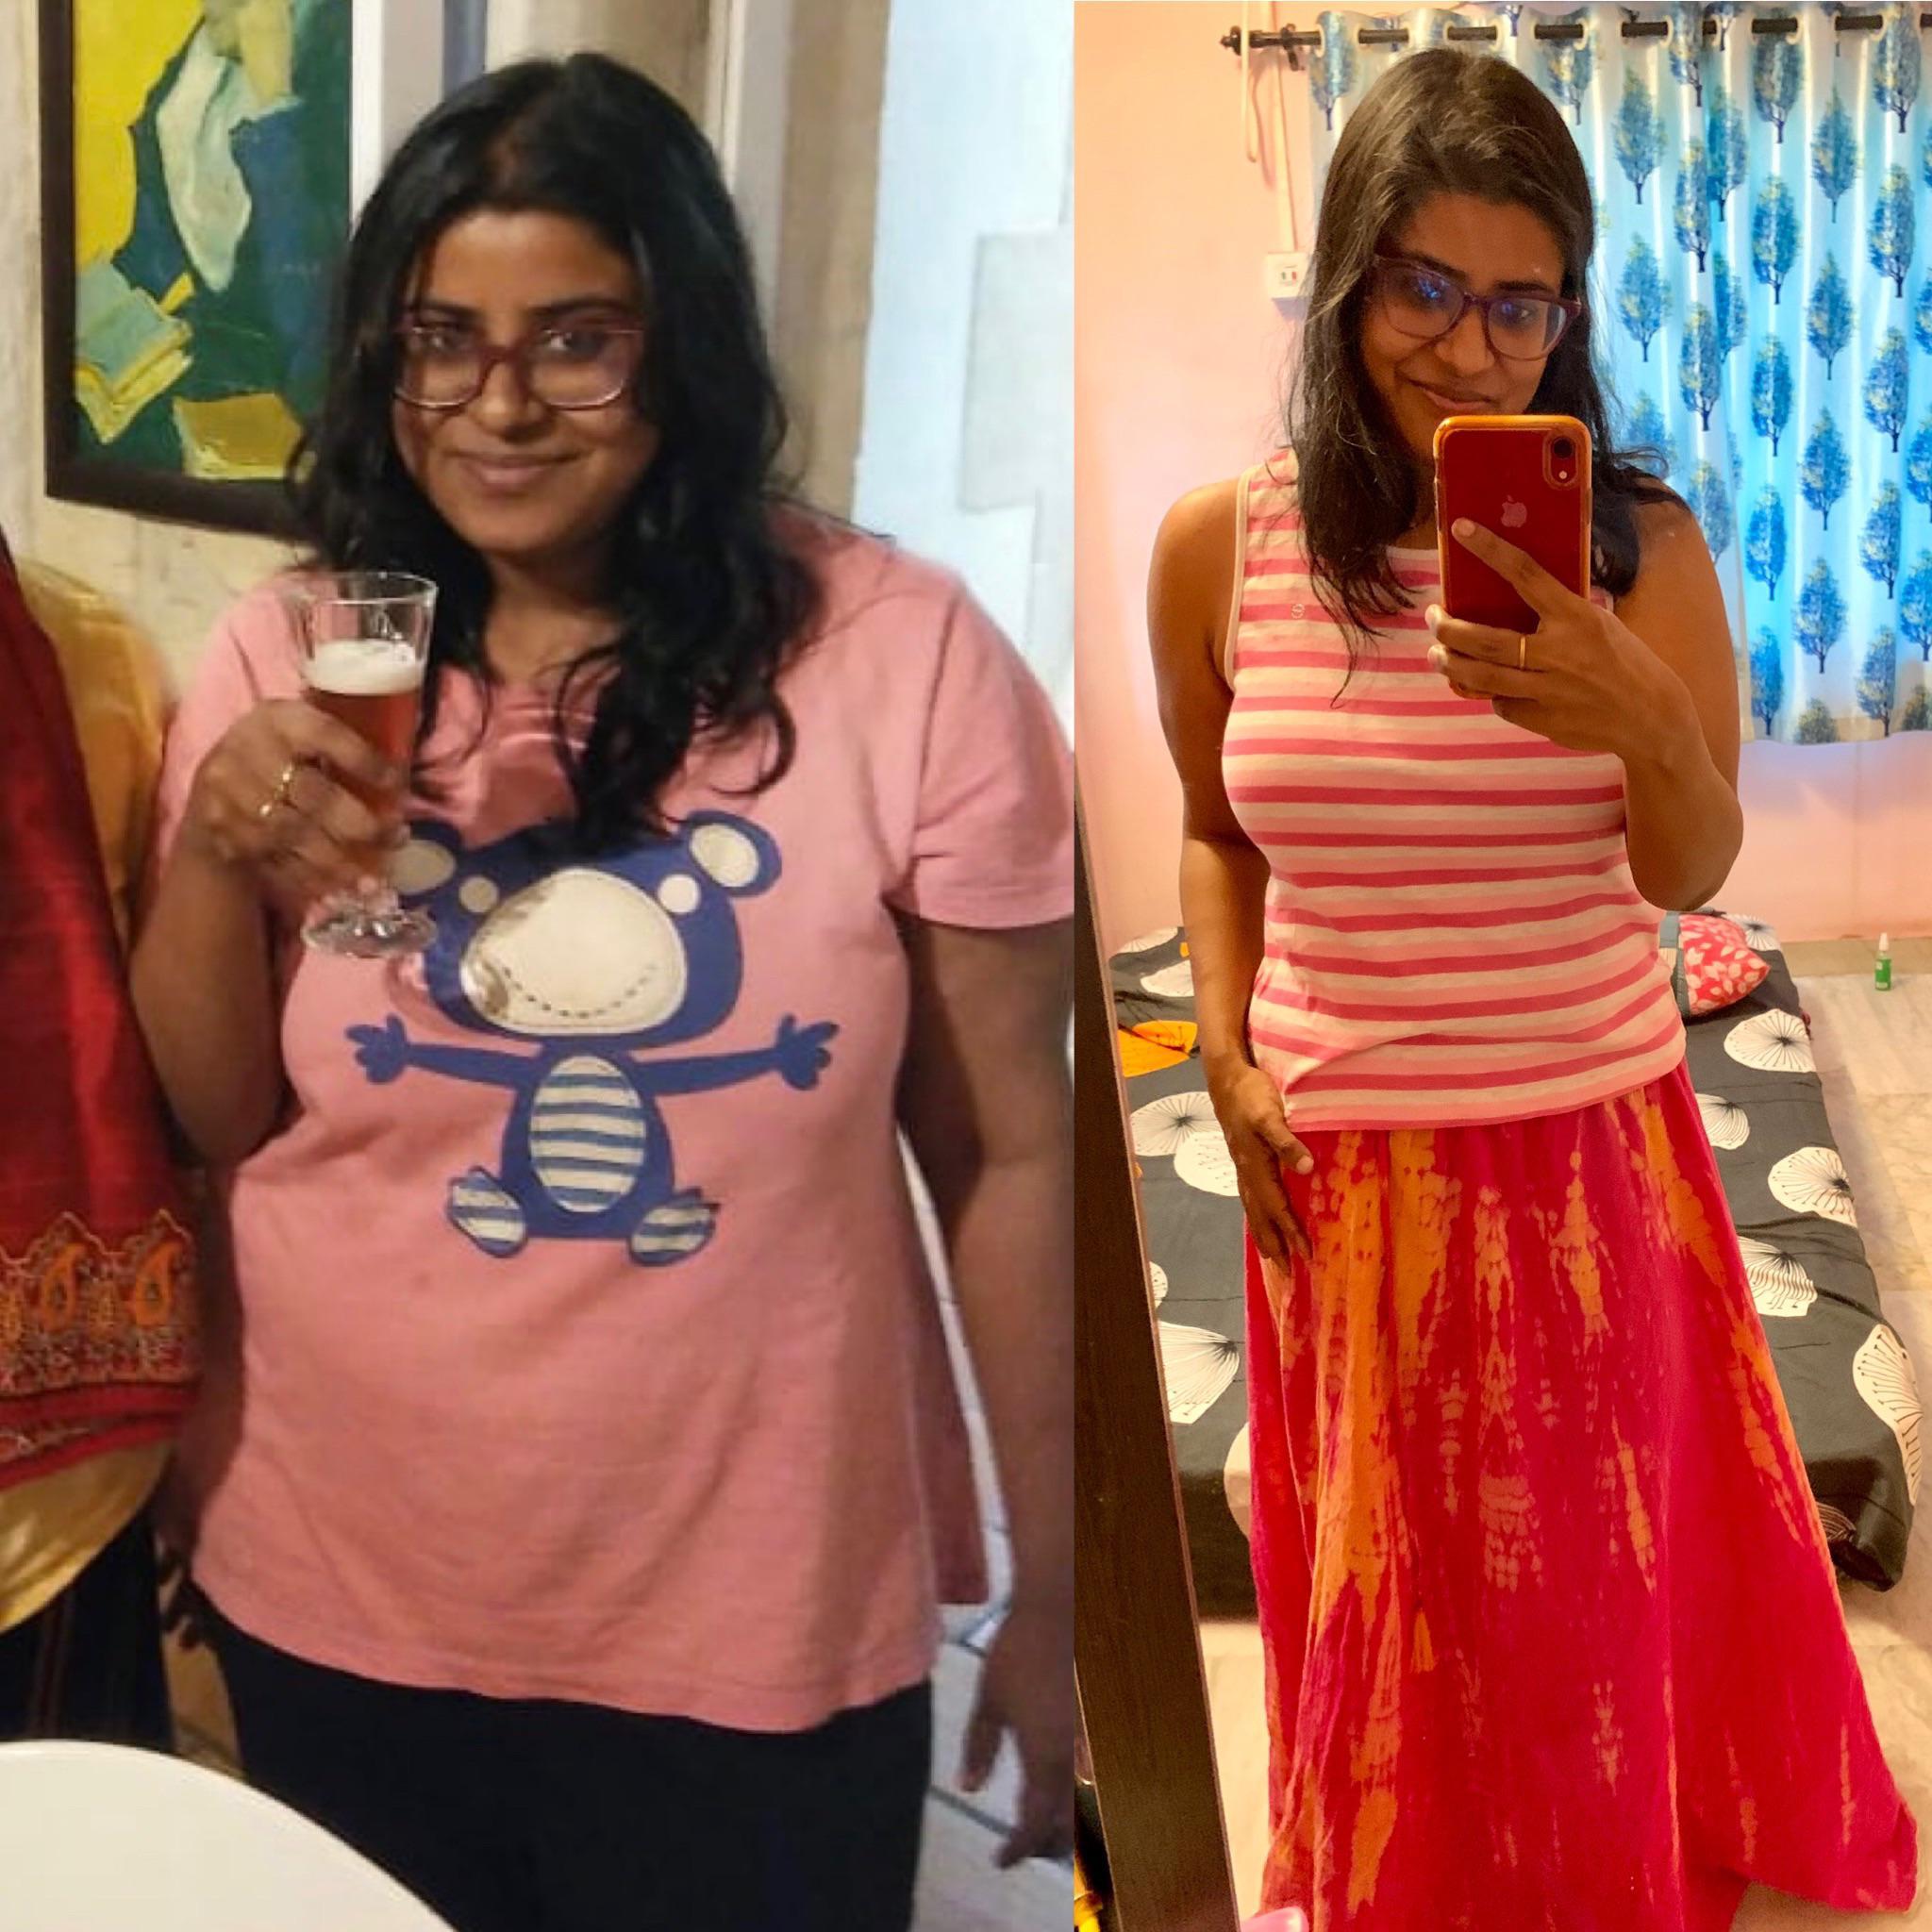 5 feet 3 Female Progress Pics of 62 lbs Weight Loss 205 lbs to 143 lbs